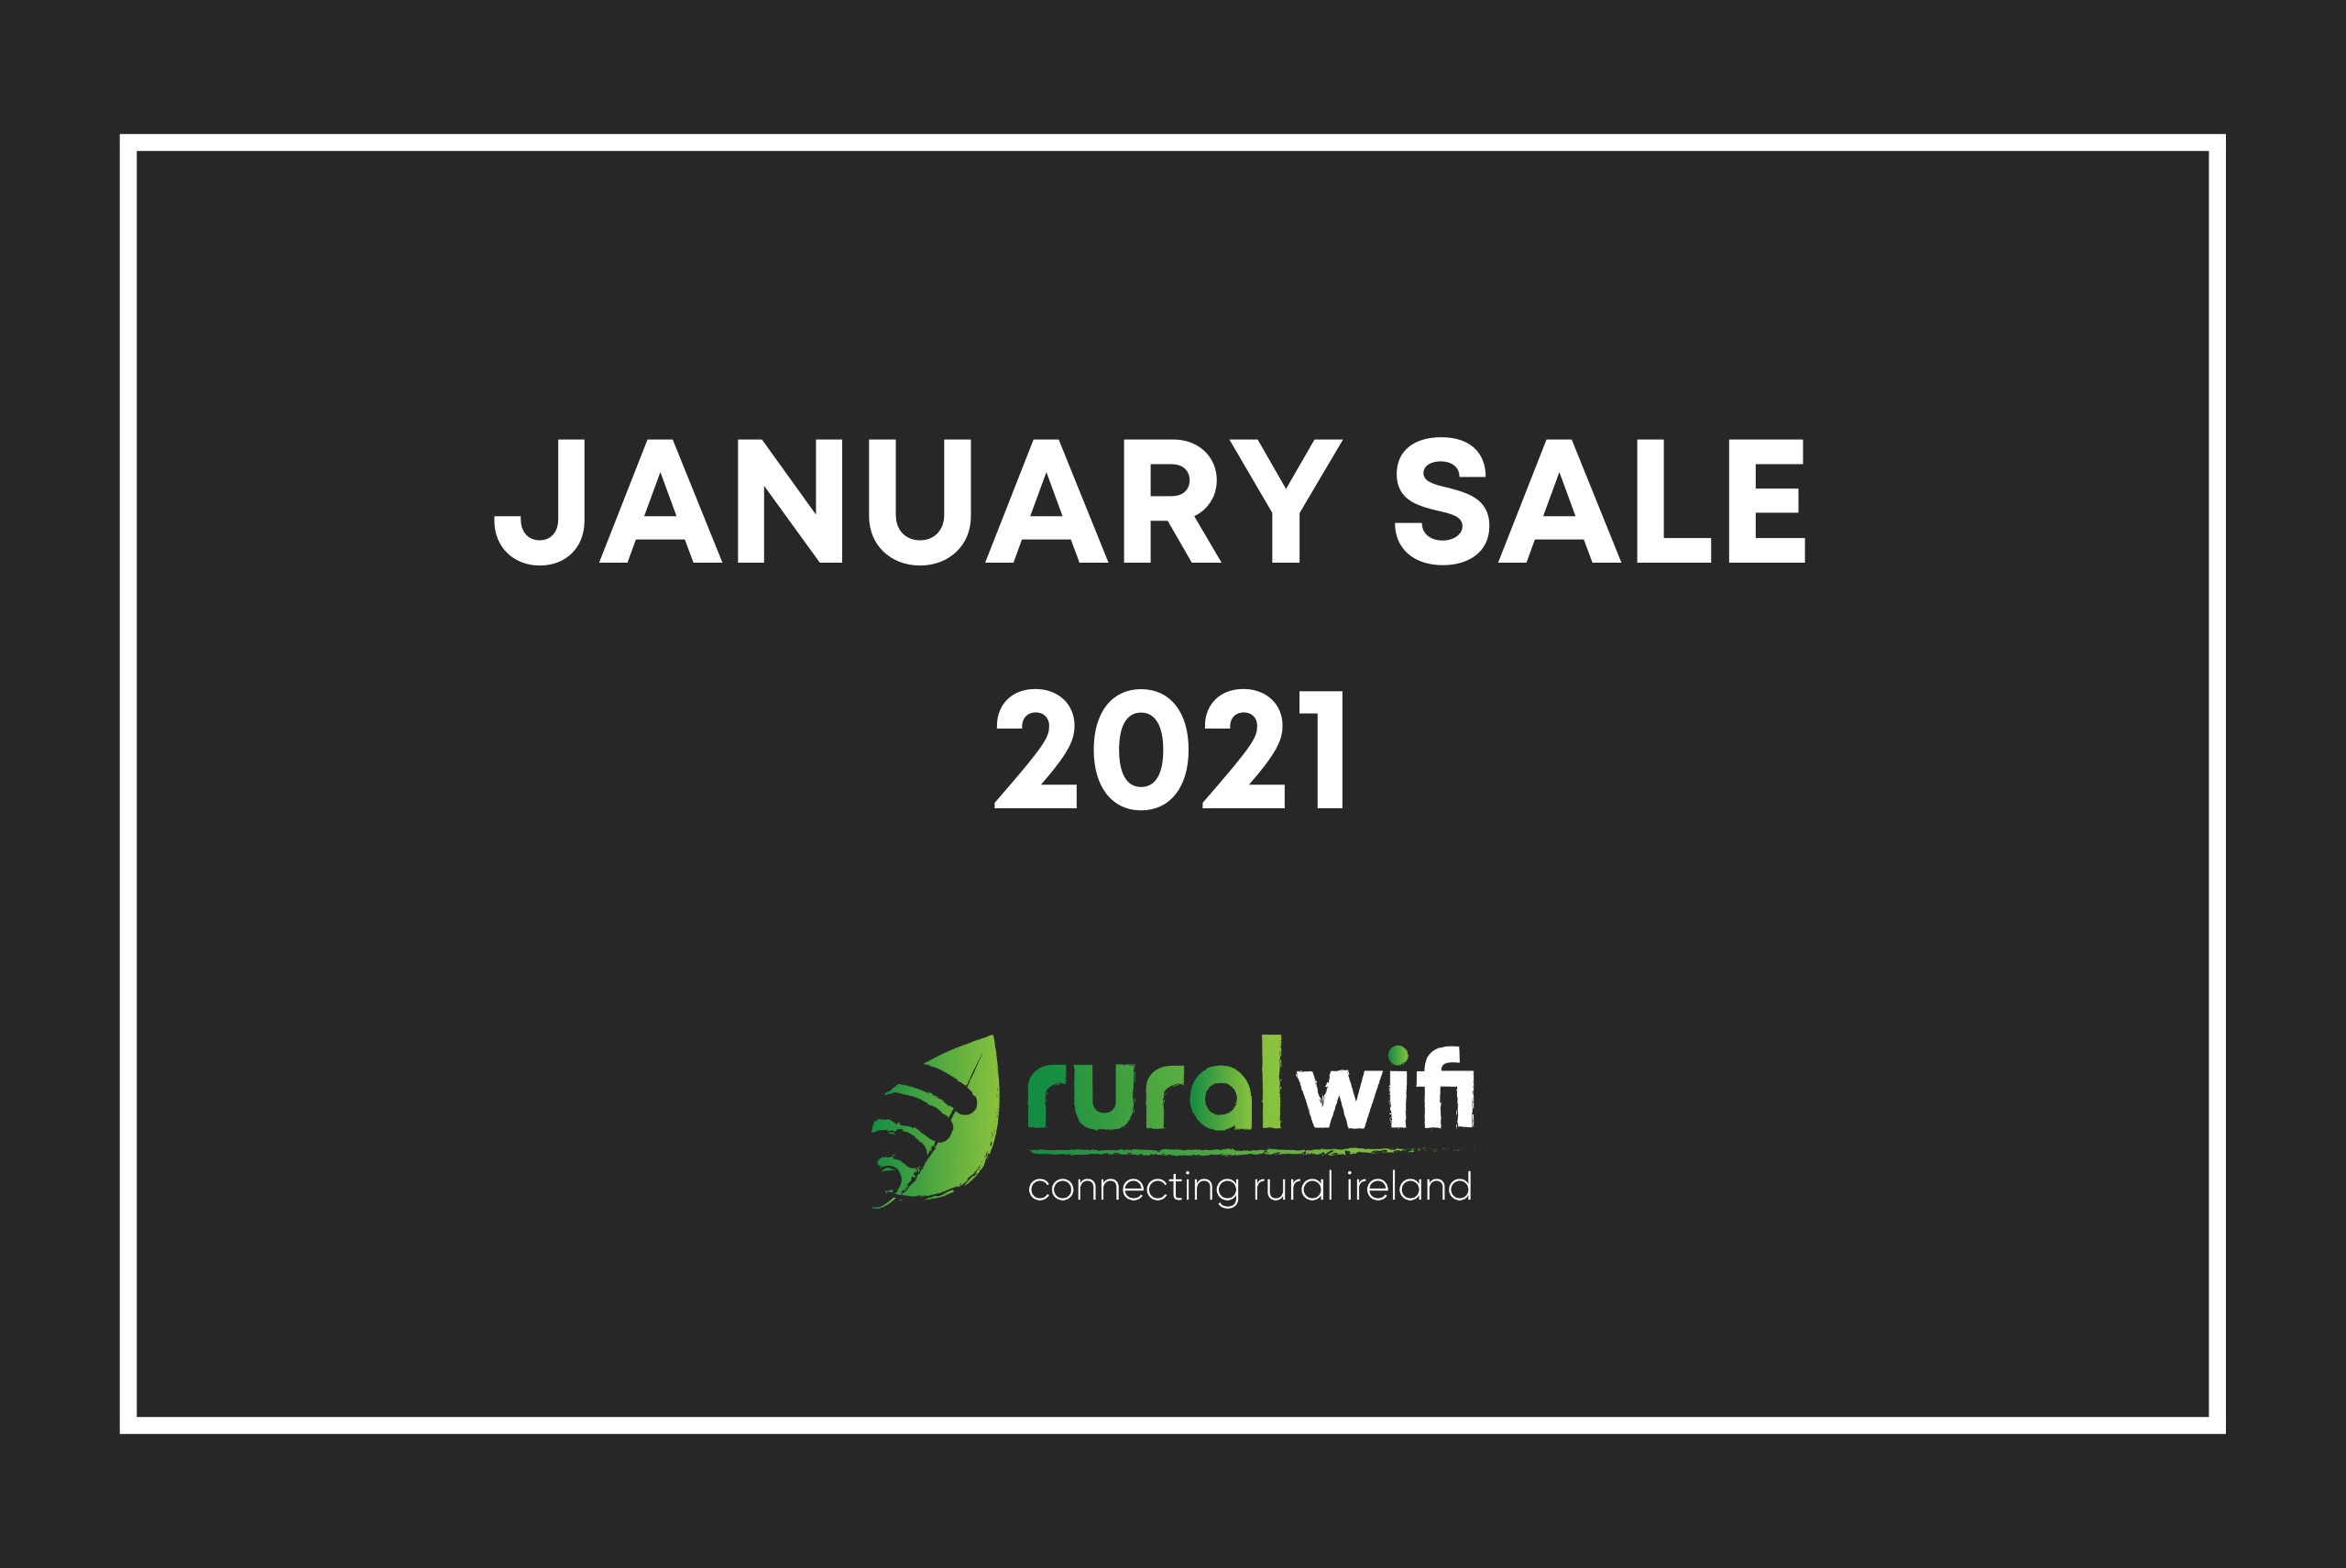 Janurary Sale 2021